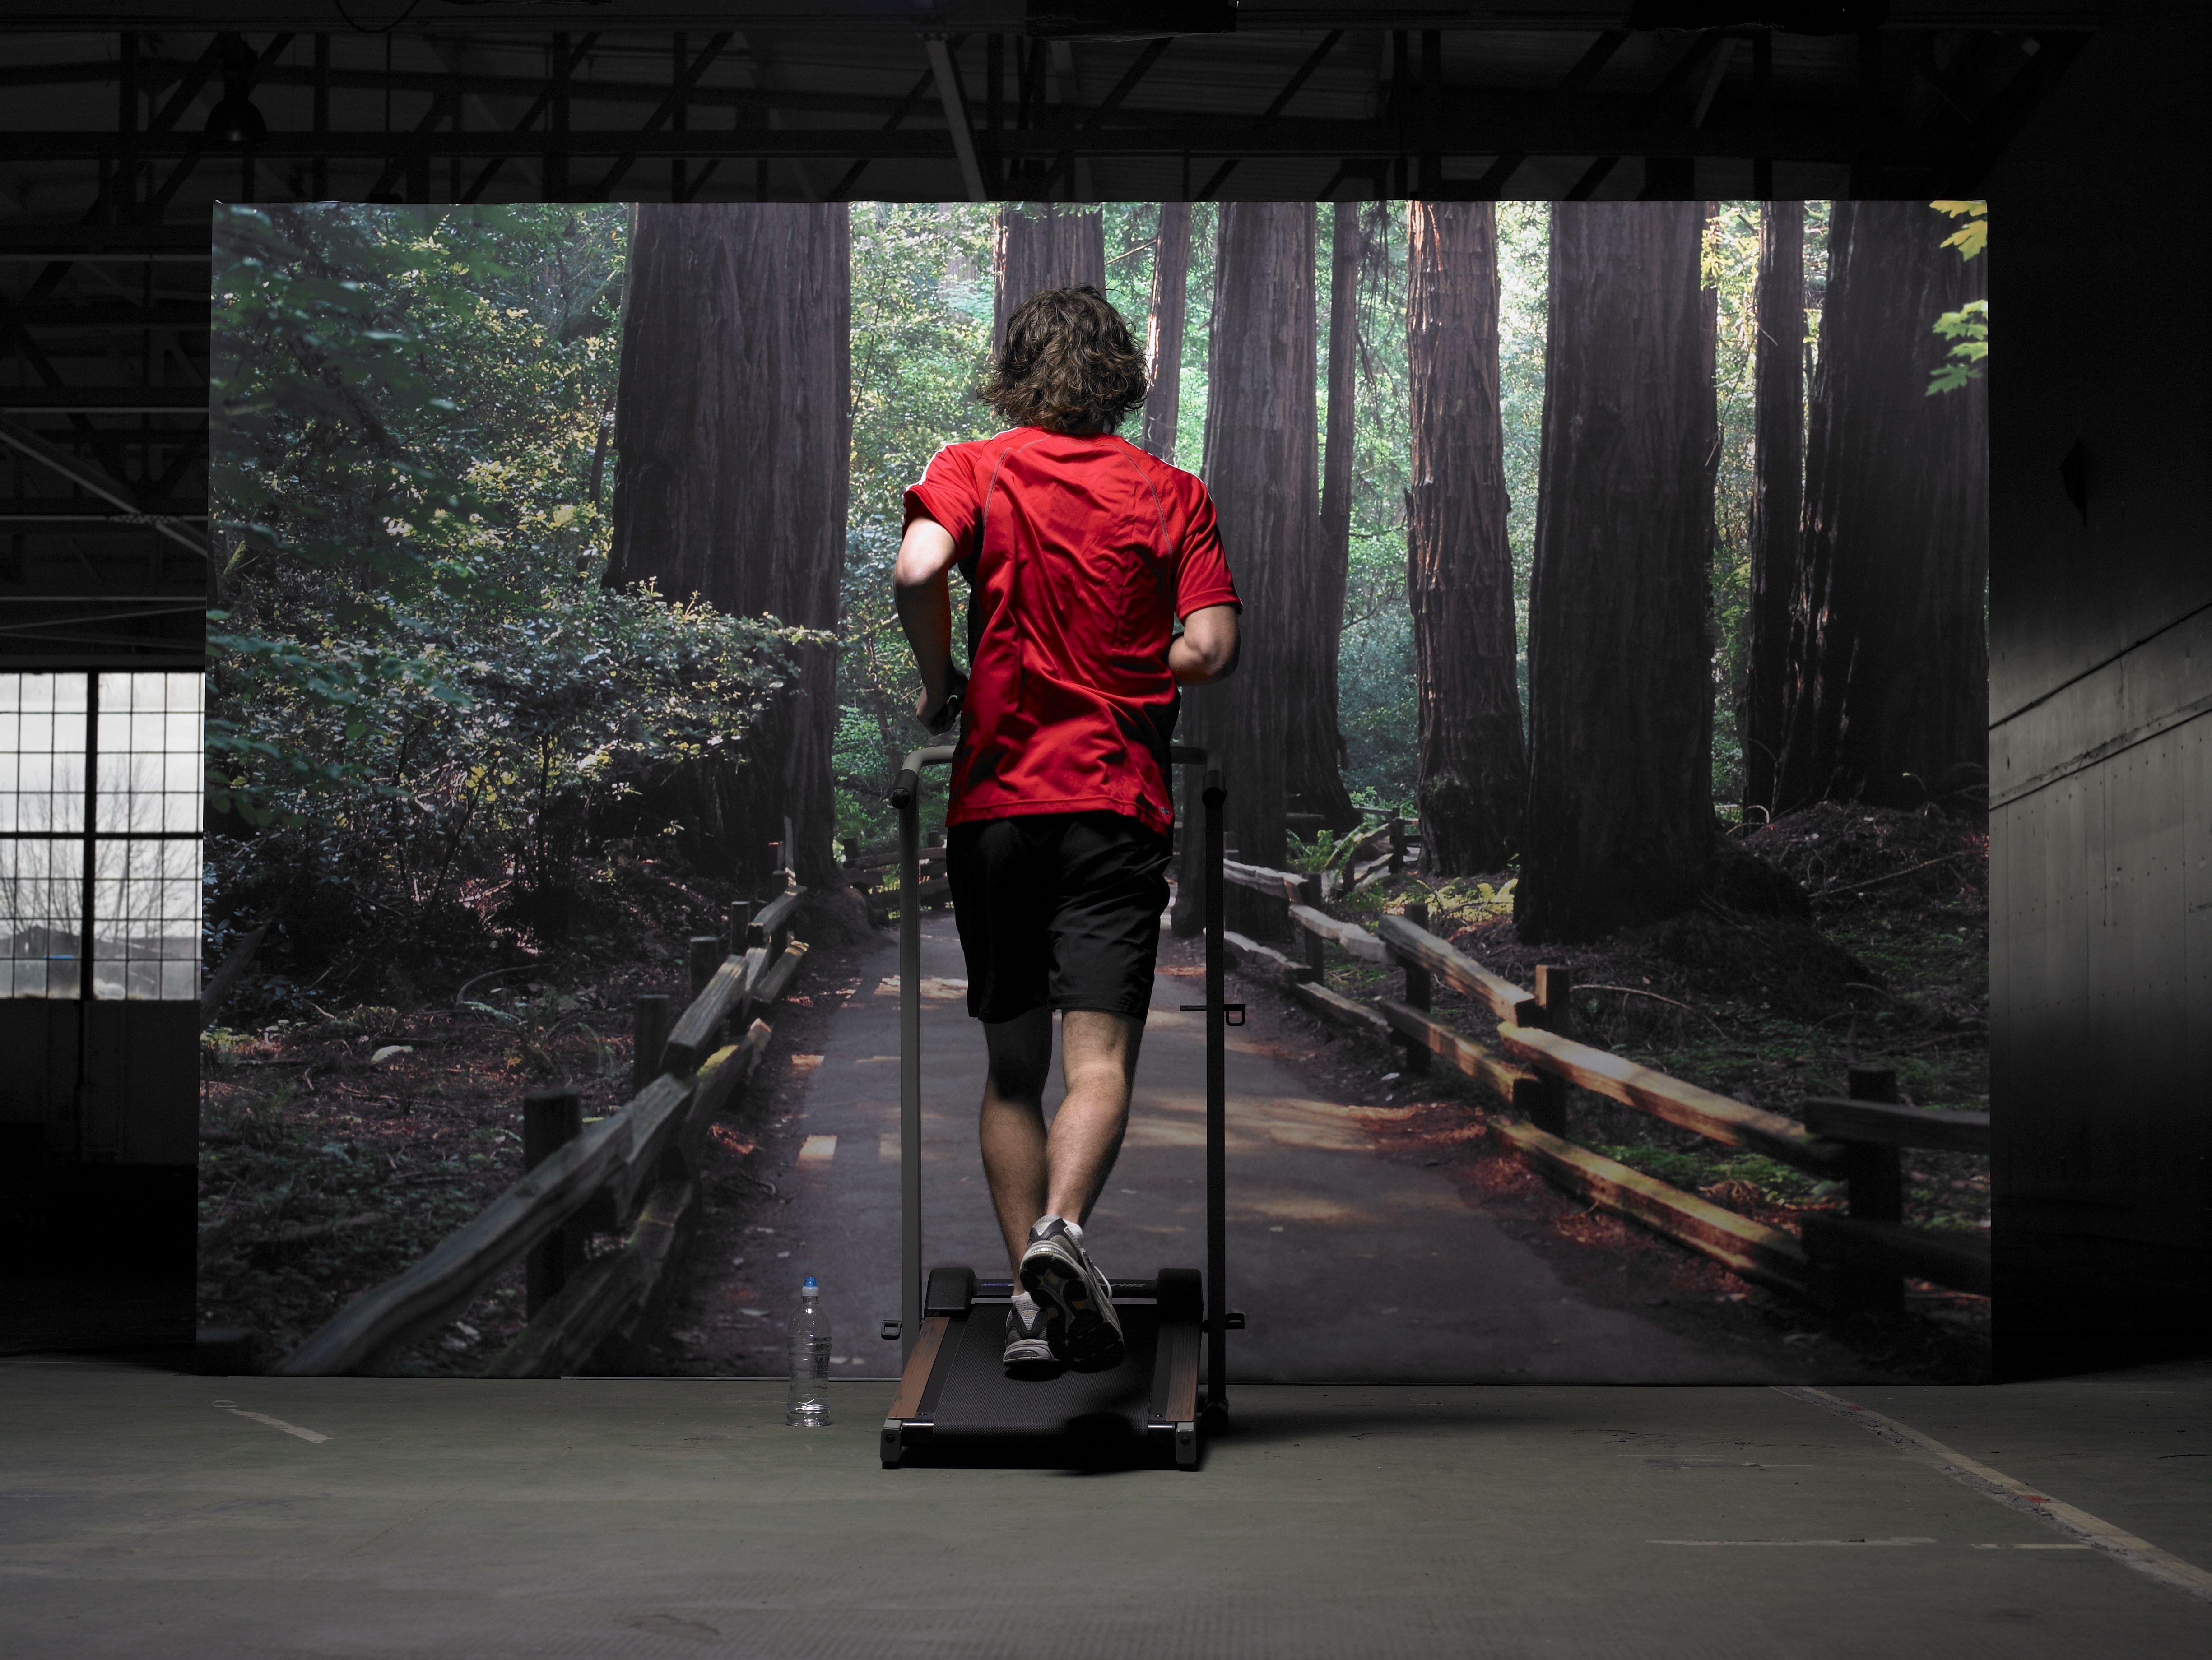 9 BoredomBusting Treadmill Workouts Treadmill workouts